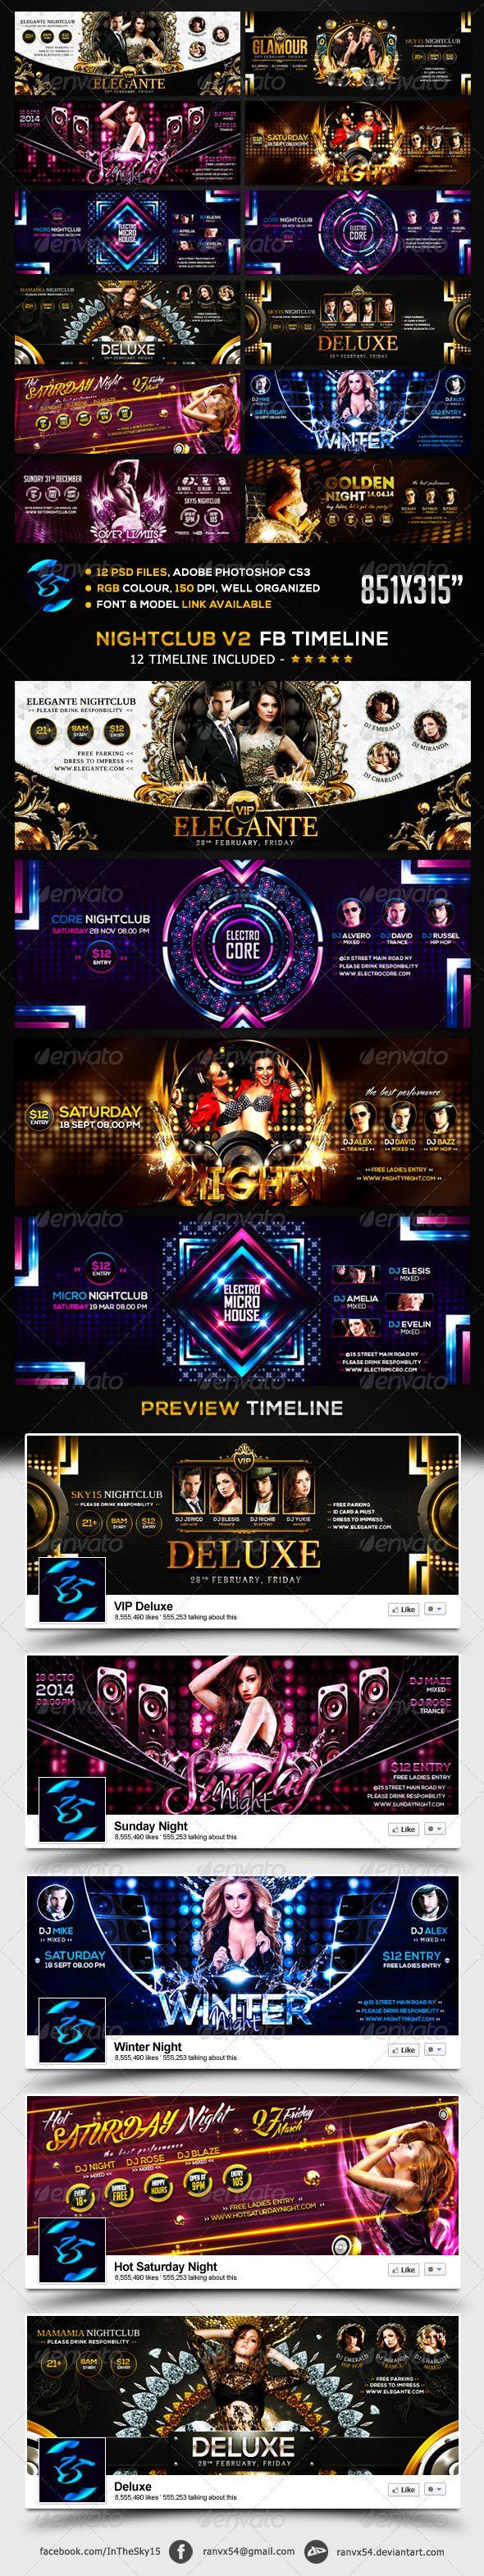 Nightclub V2 FB Timeline Cover. Download .Psd here: http://graphicriver.net/item/nightclub-v2-fb-timeline-cover/6868823 #nightclub #luxury #glamour #deluxe #winter #vip #golden #sensation #electro #techno #dubstep